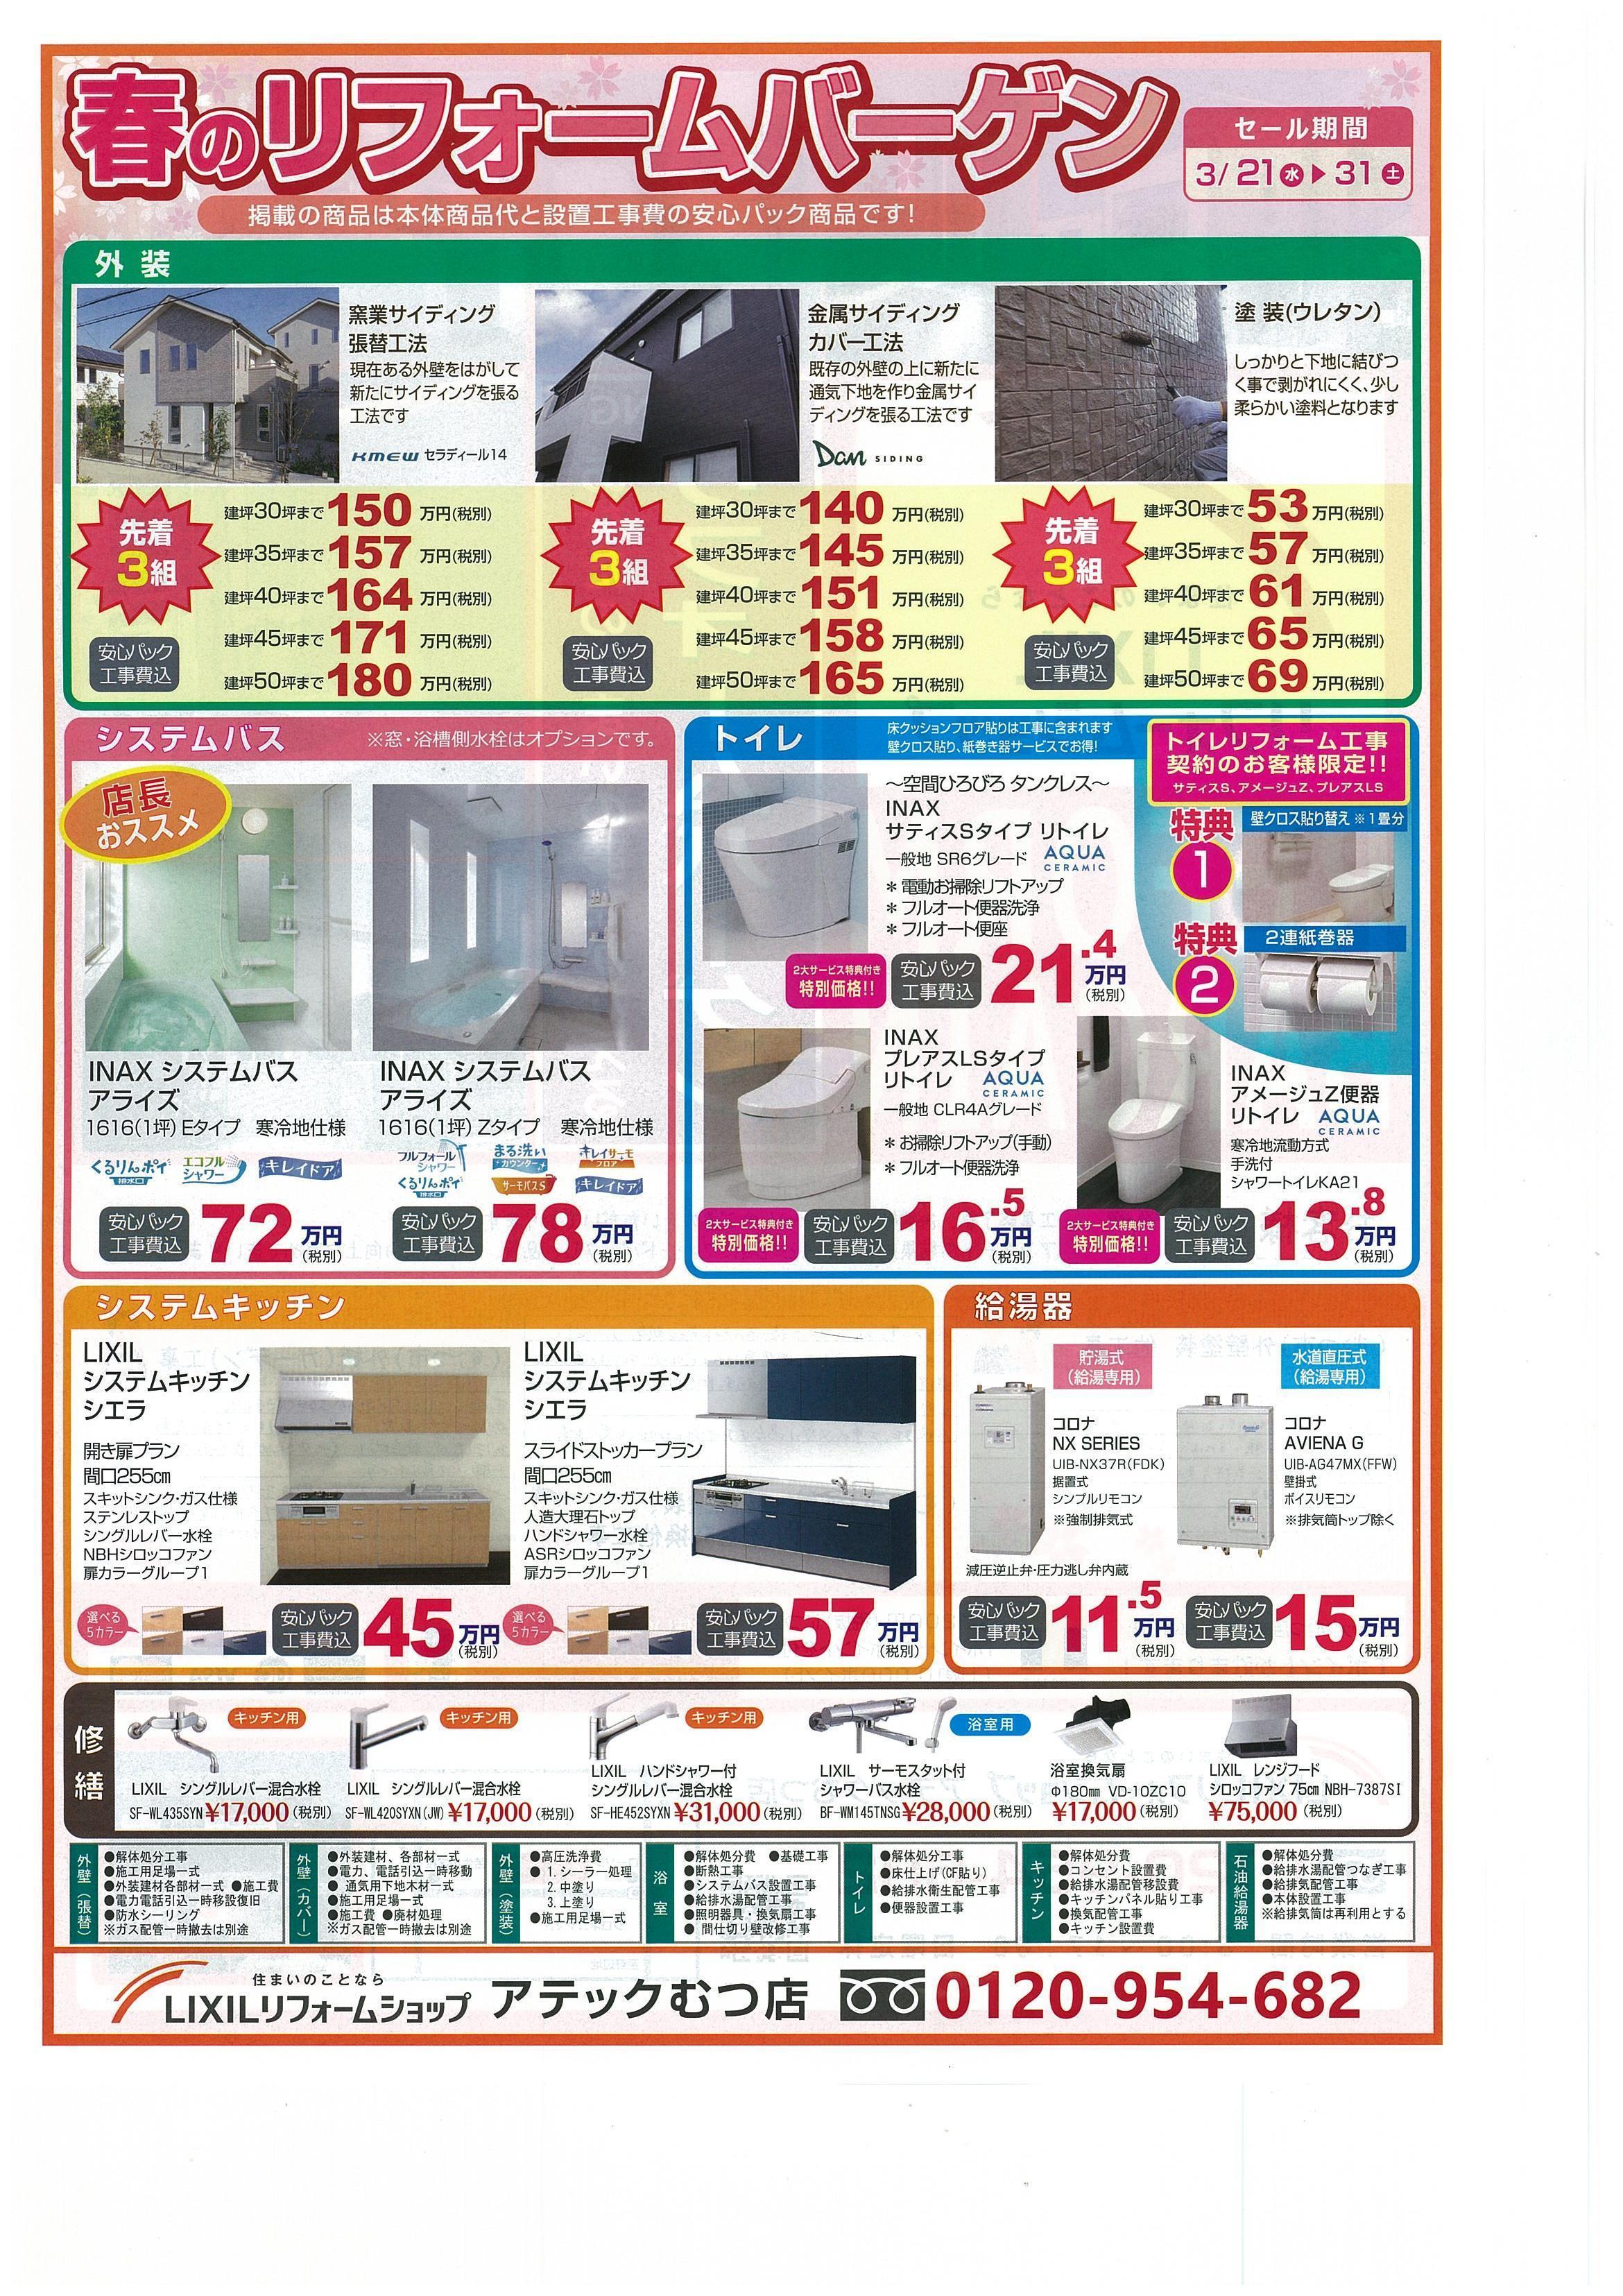 https://lixil-reformshop.jp/shop/SC00021006/photos/1e75a912f9b36e9063645935372f08b5dcd448c8.jpg